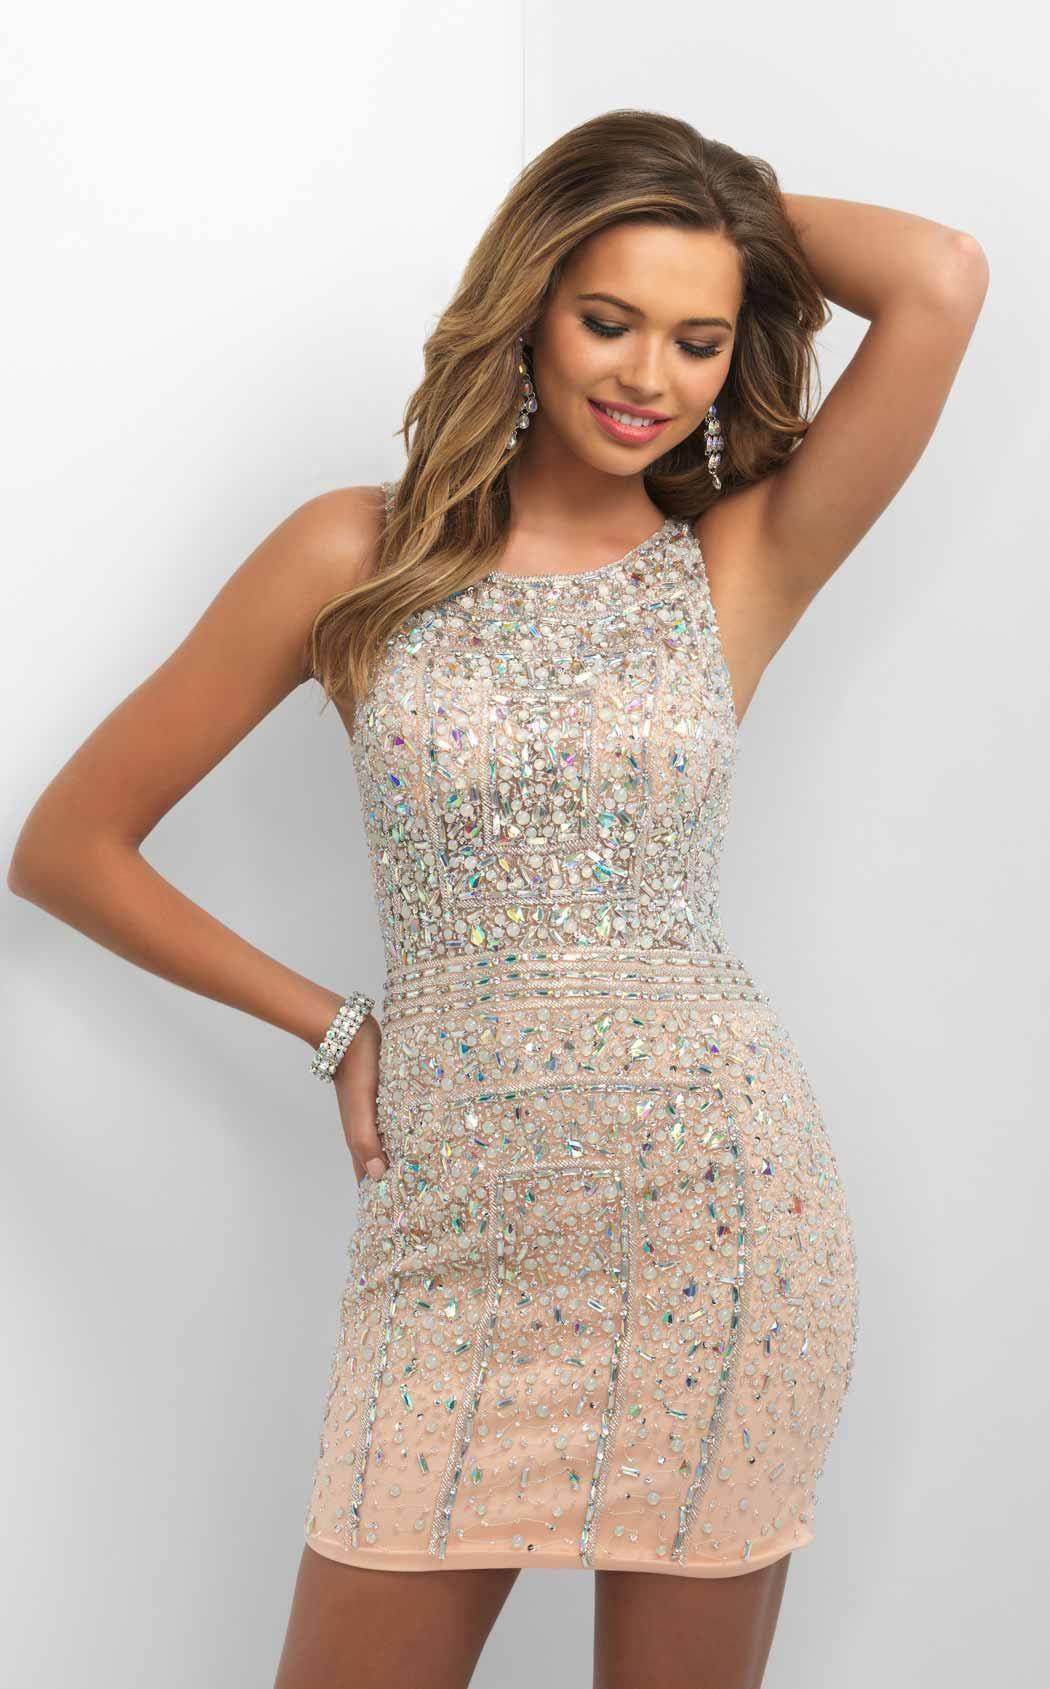 Shine on wearing this blush c cocktail dress this sleeveless